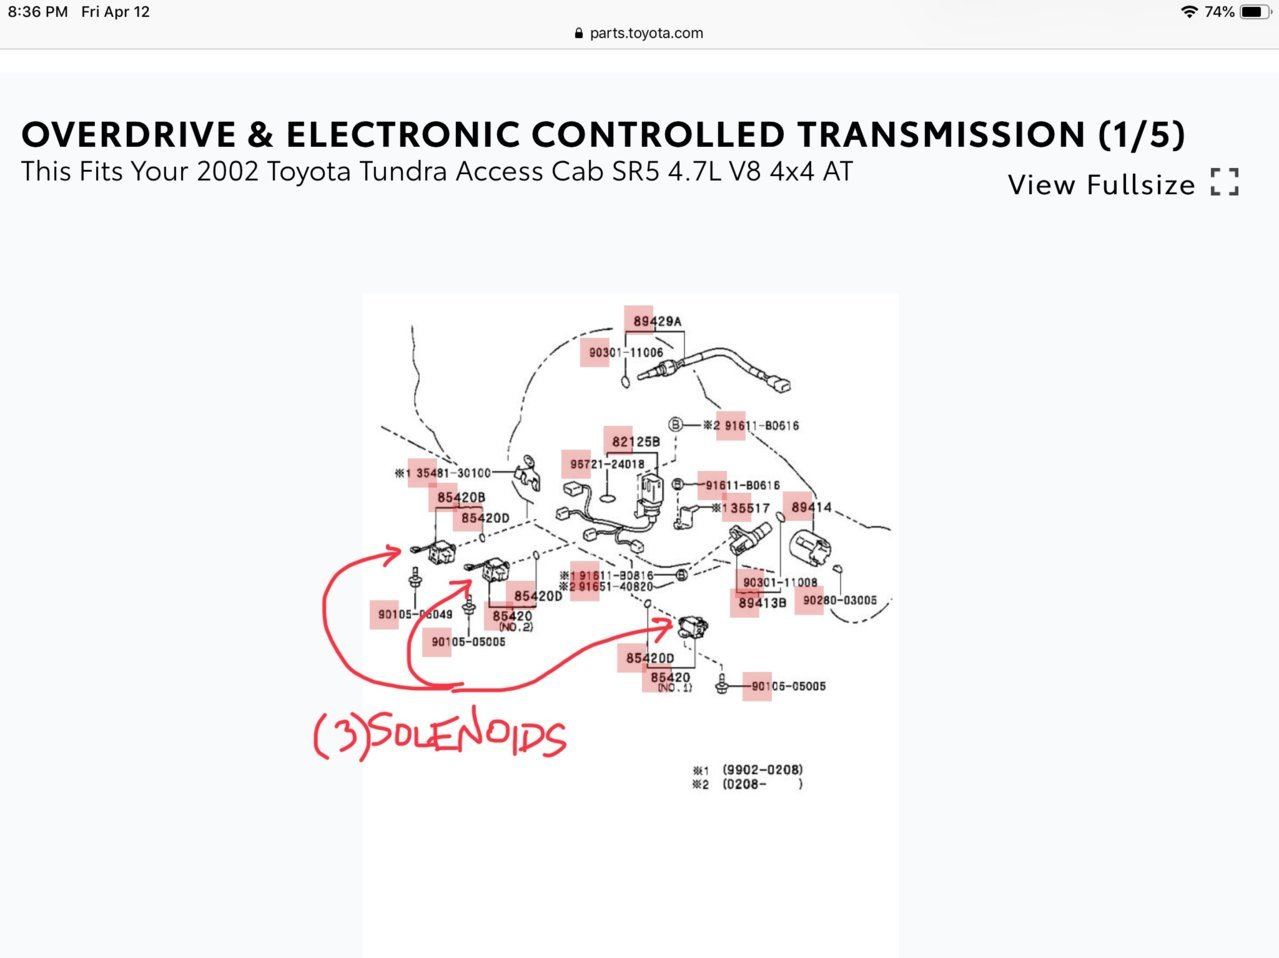 [FPER_4992]  B97FC0D Overdrive Wiring Diagram For Toyota Tundra | Wiring Resources | Overdrive Wiring Diagram For Toyota Tundra |  | Wiring Resources